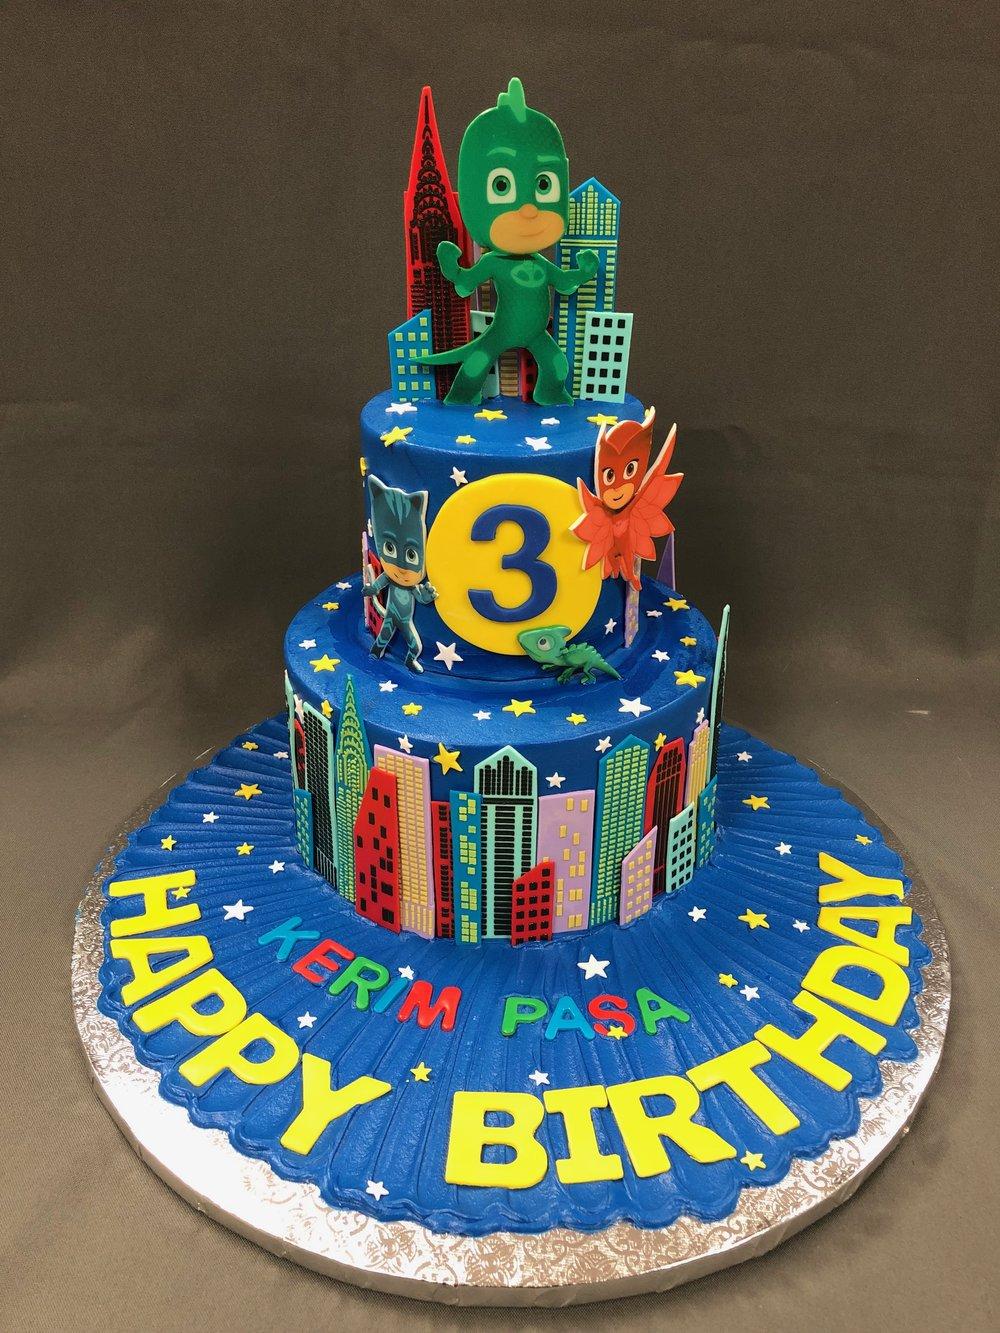 JP Masks Themed Birthday Cake New Jersey